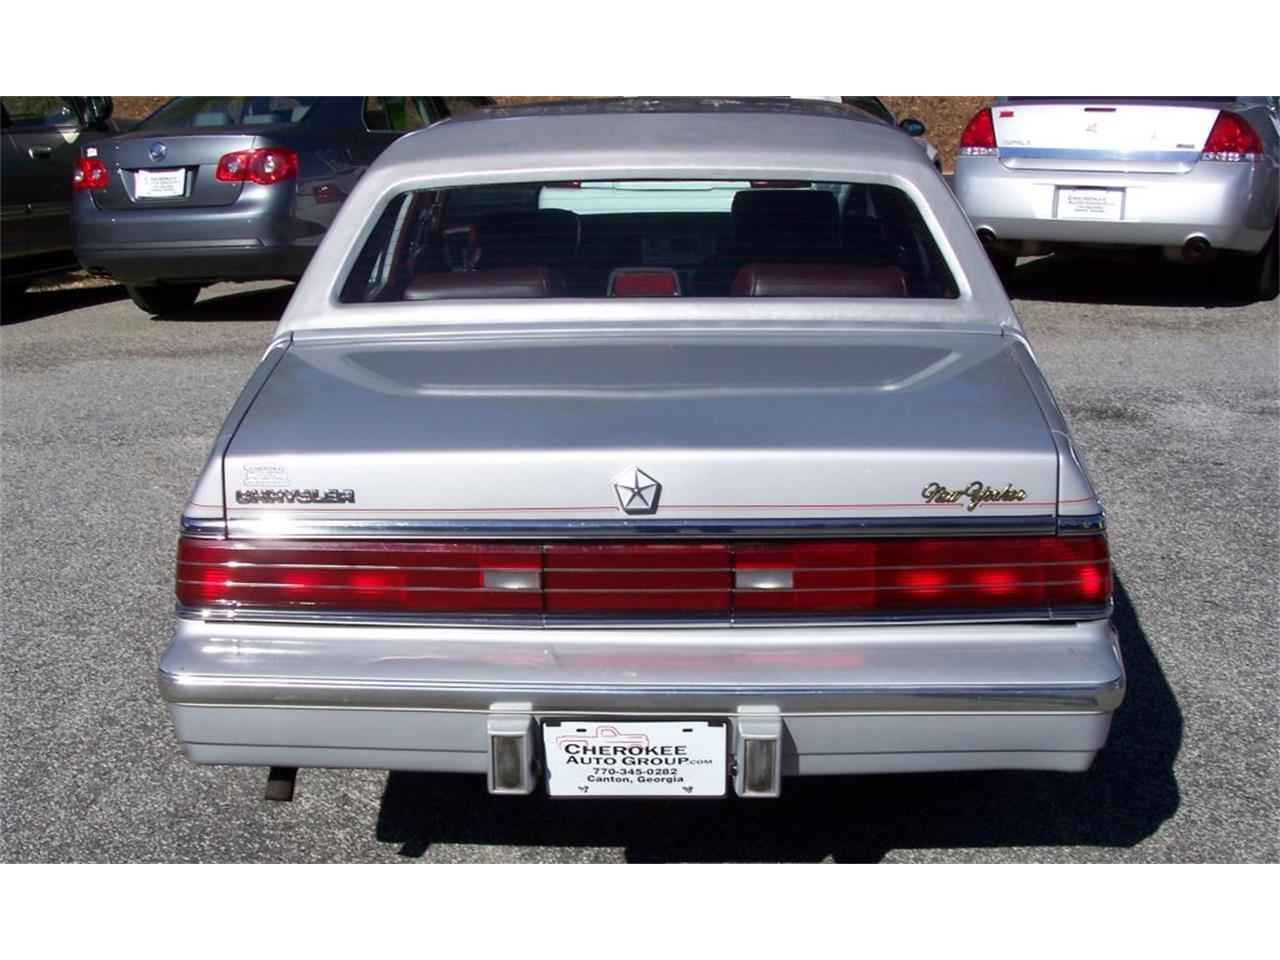 1987 chrysler new yorker turbo for sale classiccars com cc 743401 1987 chrysler new yorker turbo for sale